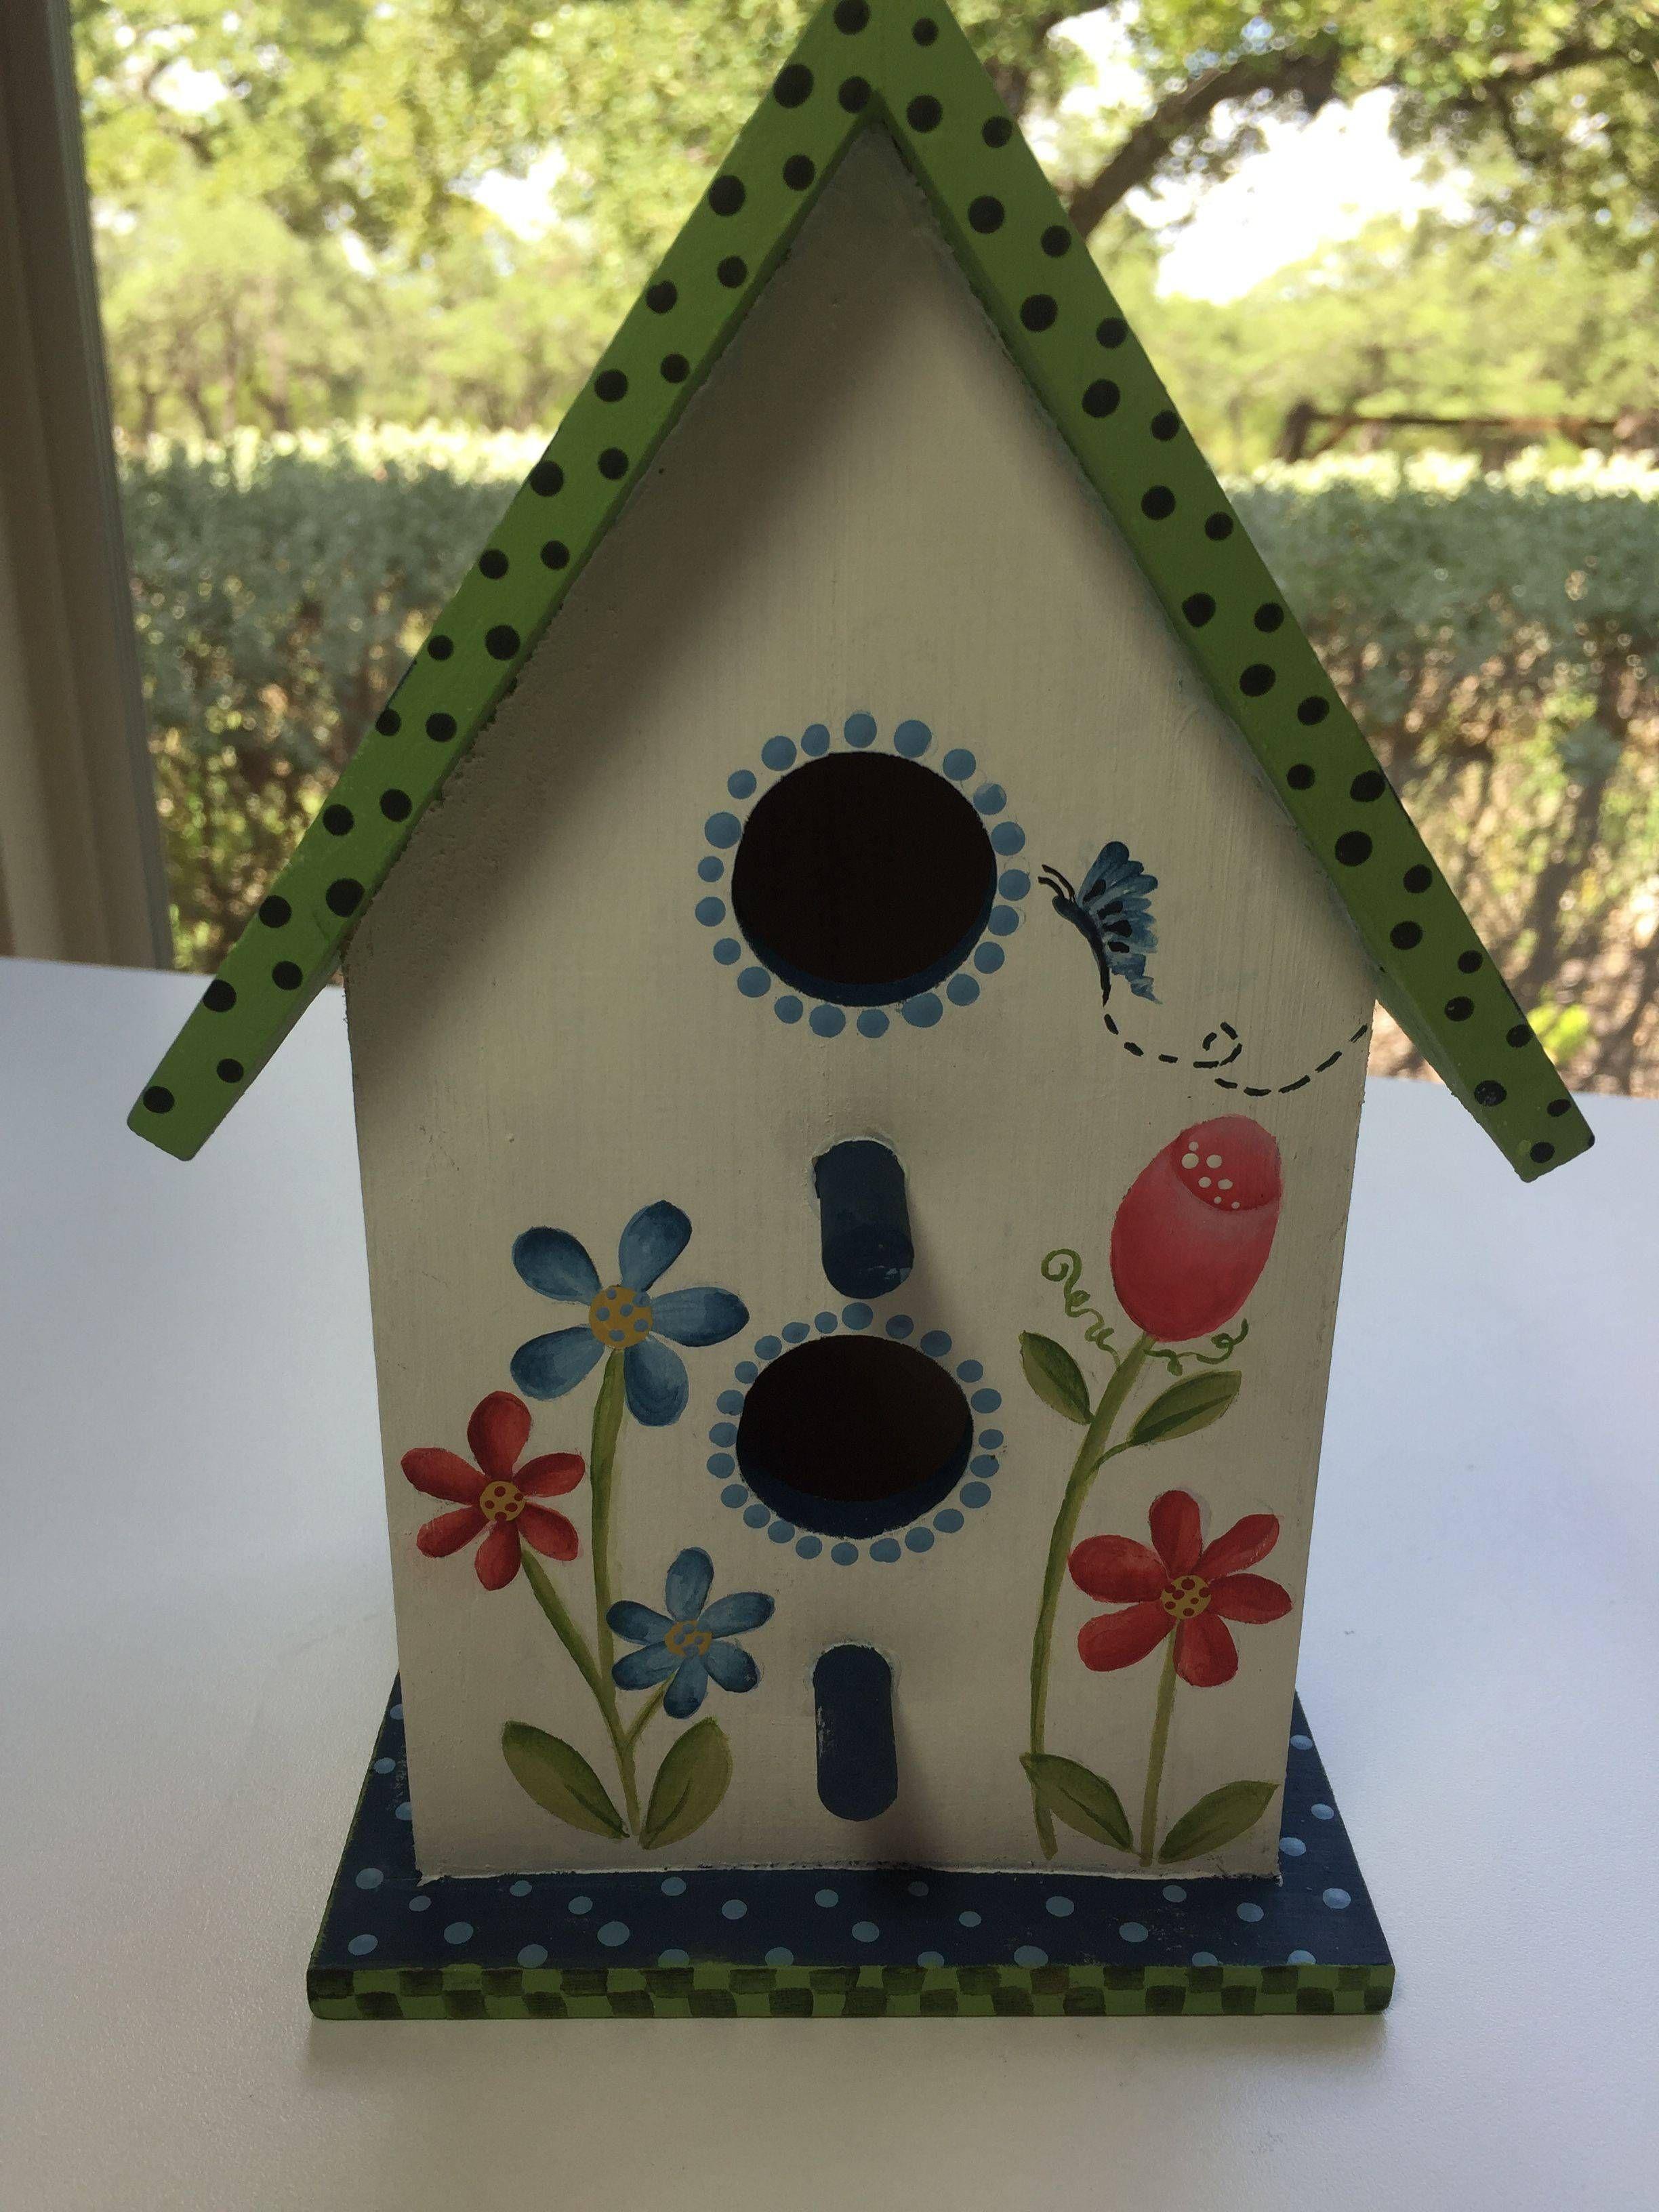 Decorative Outdoor Bird Houses In 2020 Bird Houses Painted